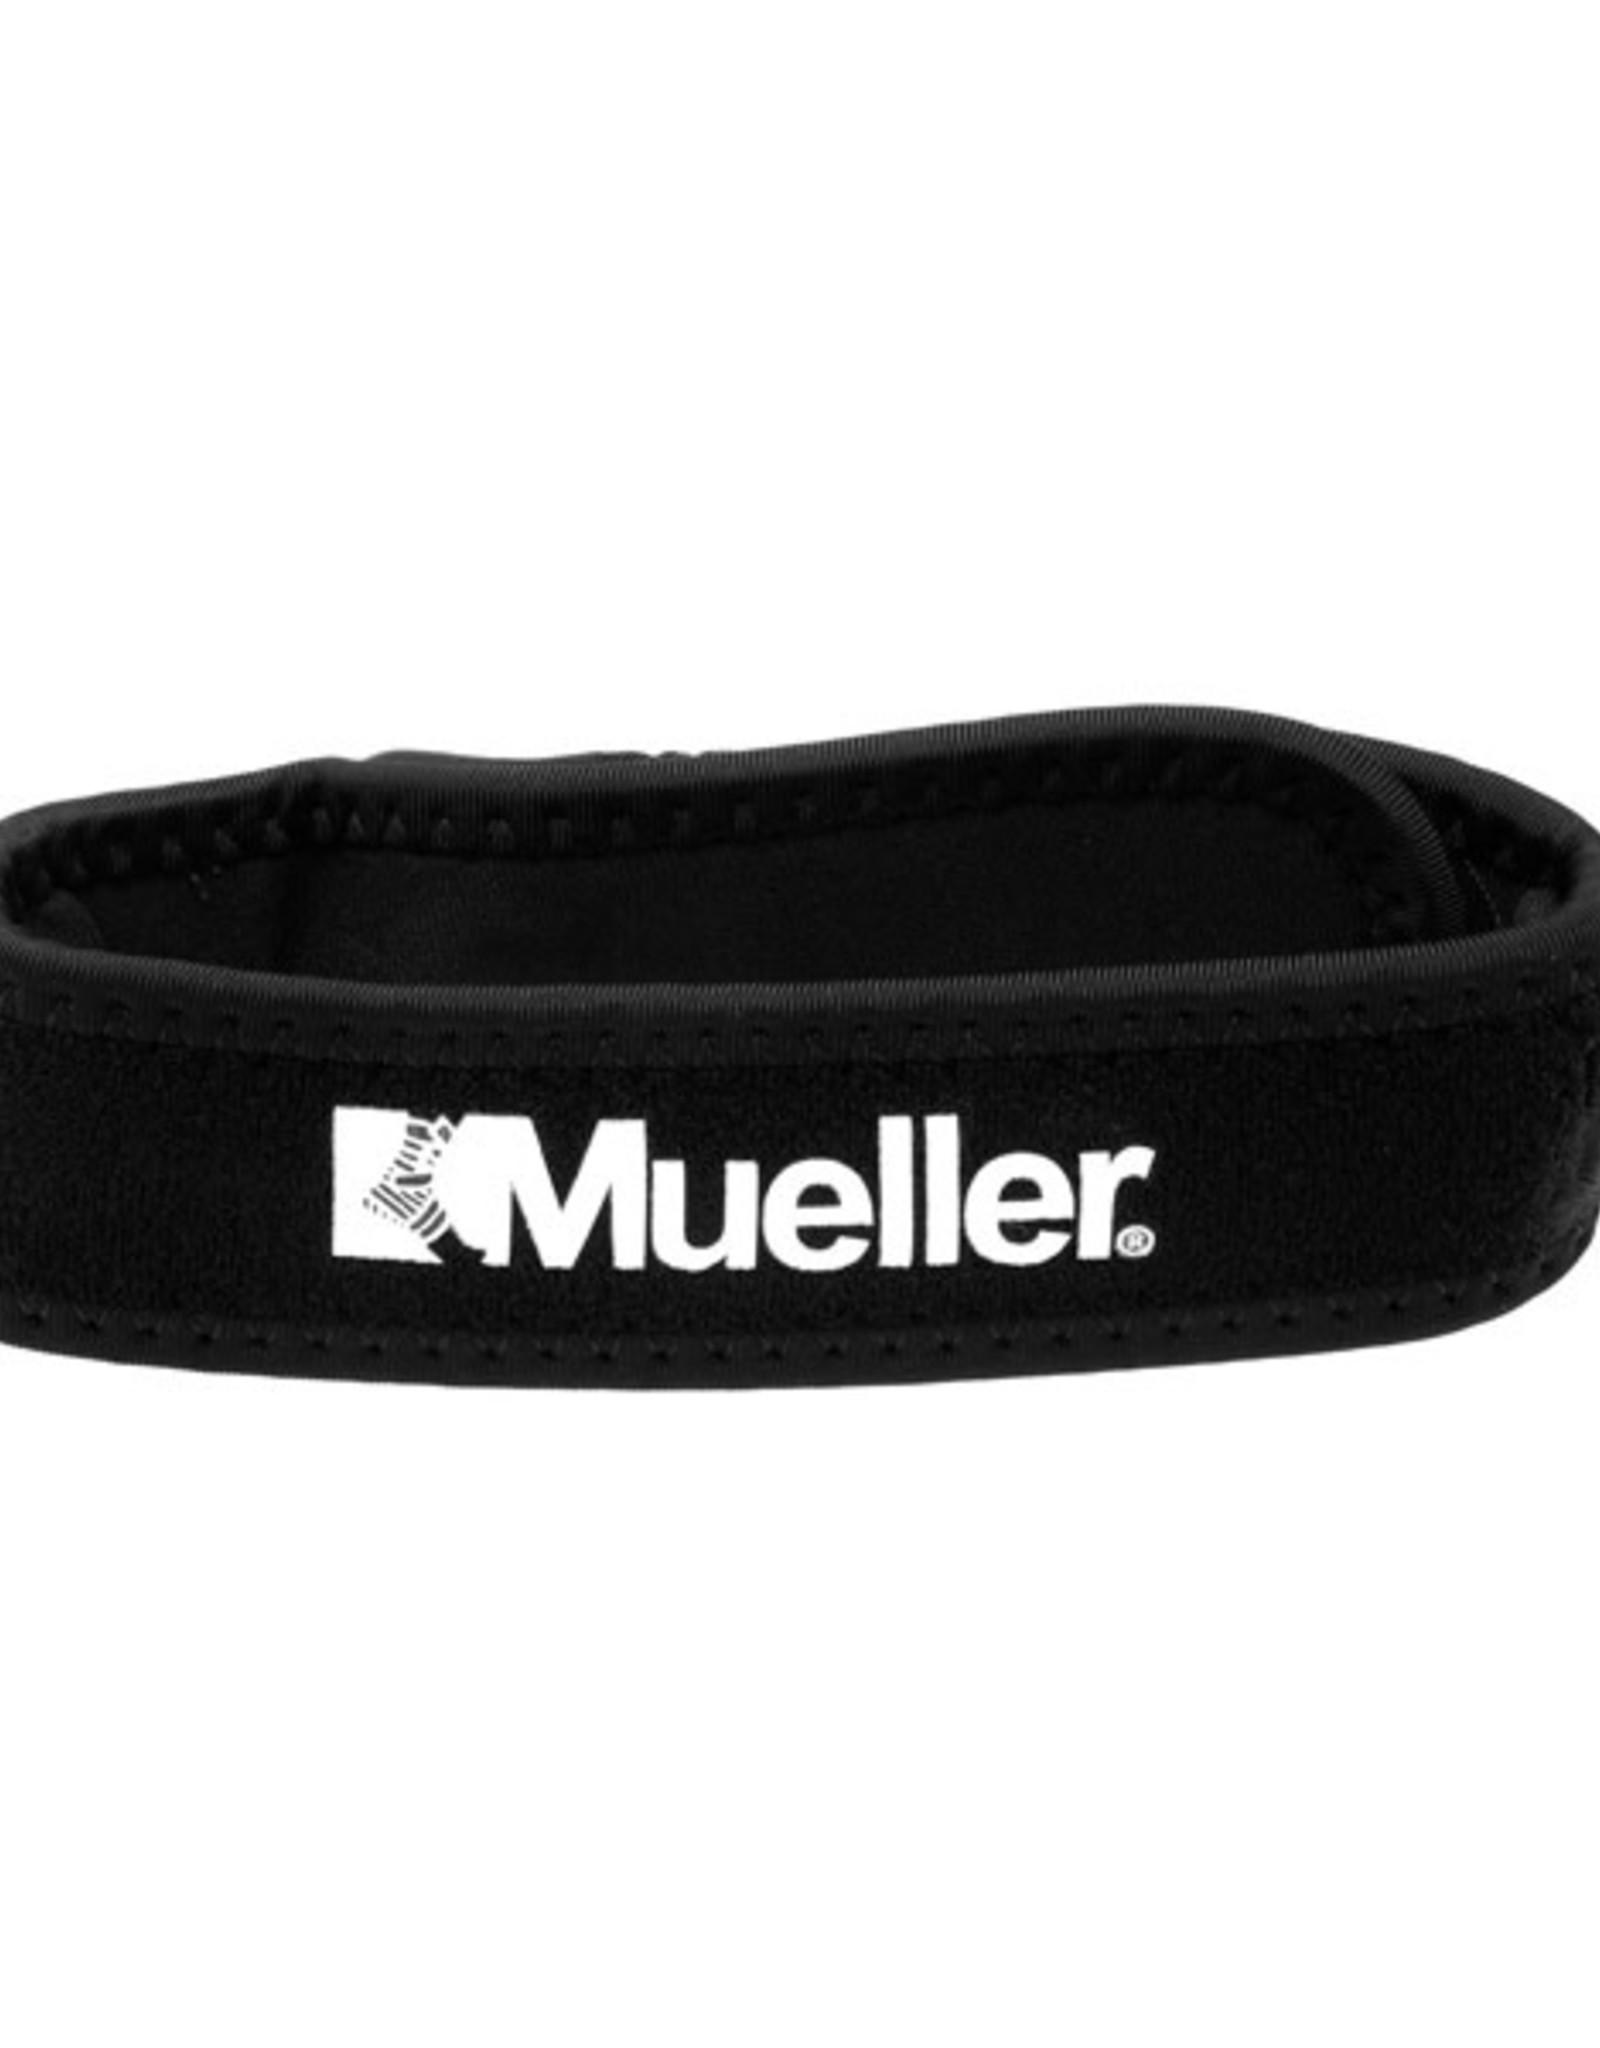 Mueller Jumpers Knee Strap Black